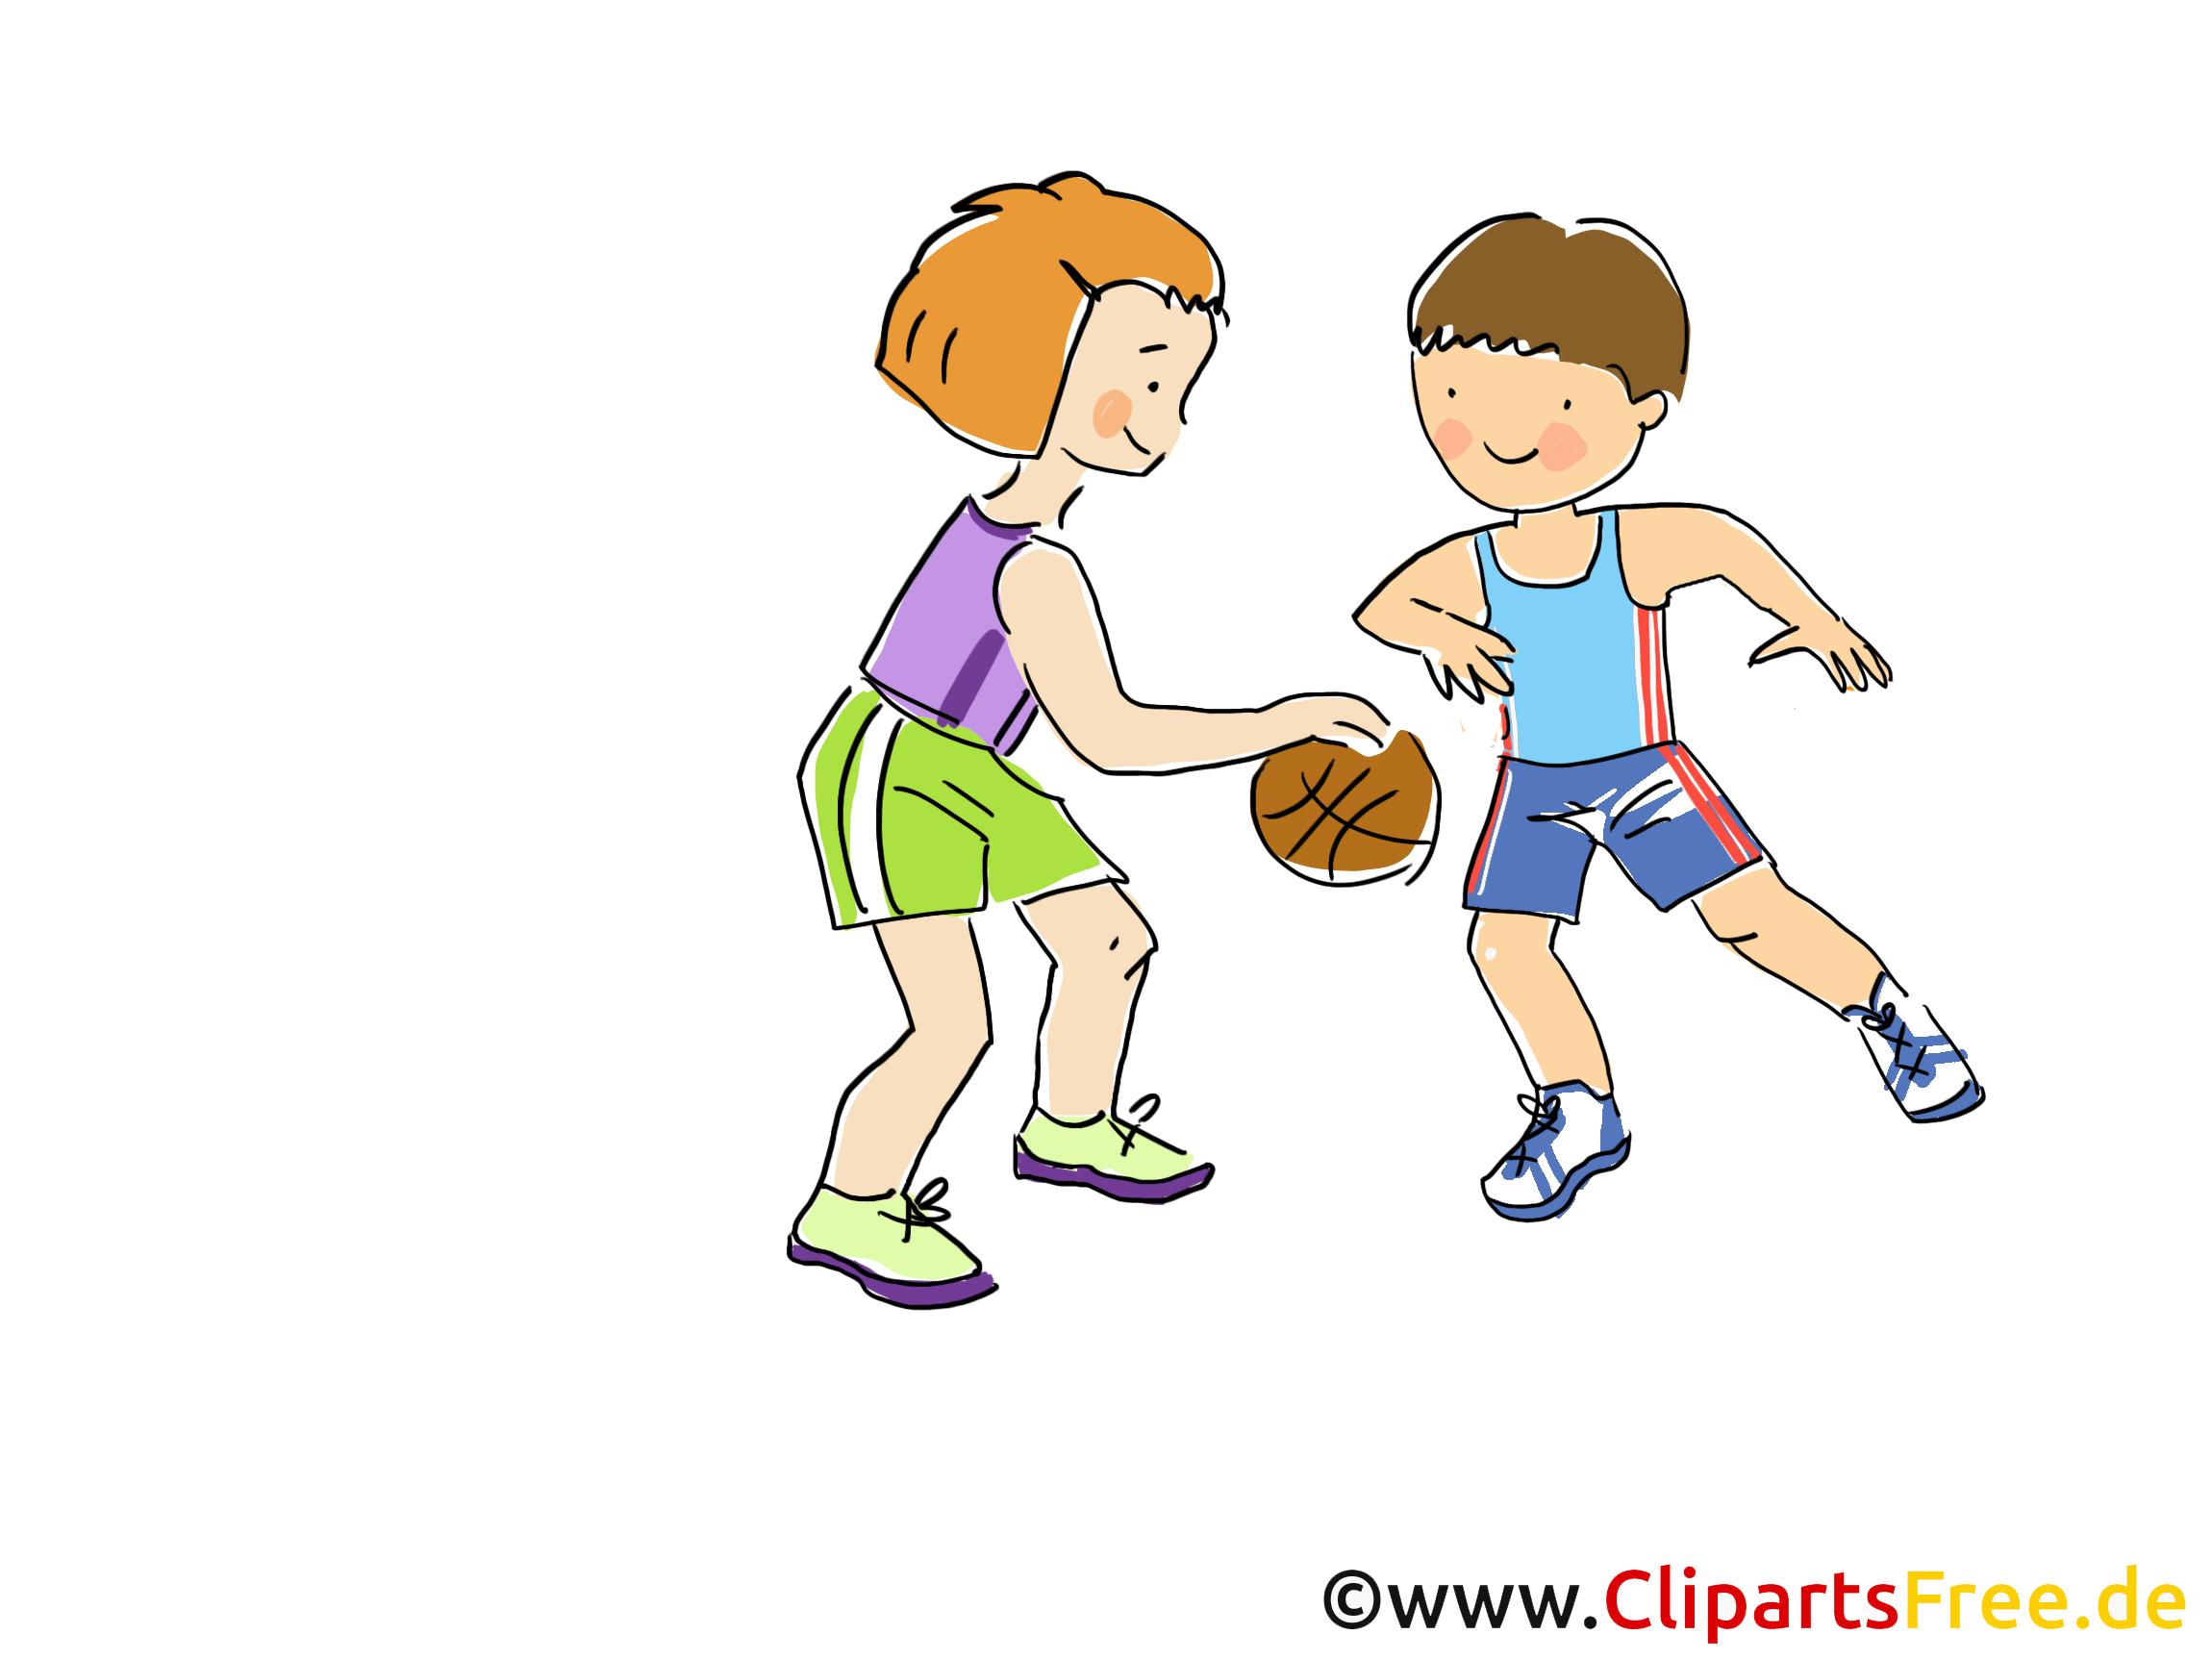 Bild clipart #8, Download drawings